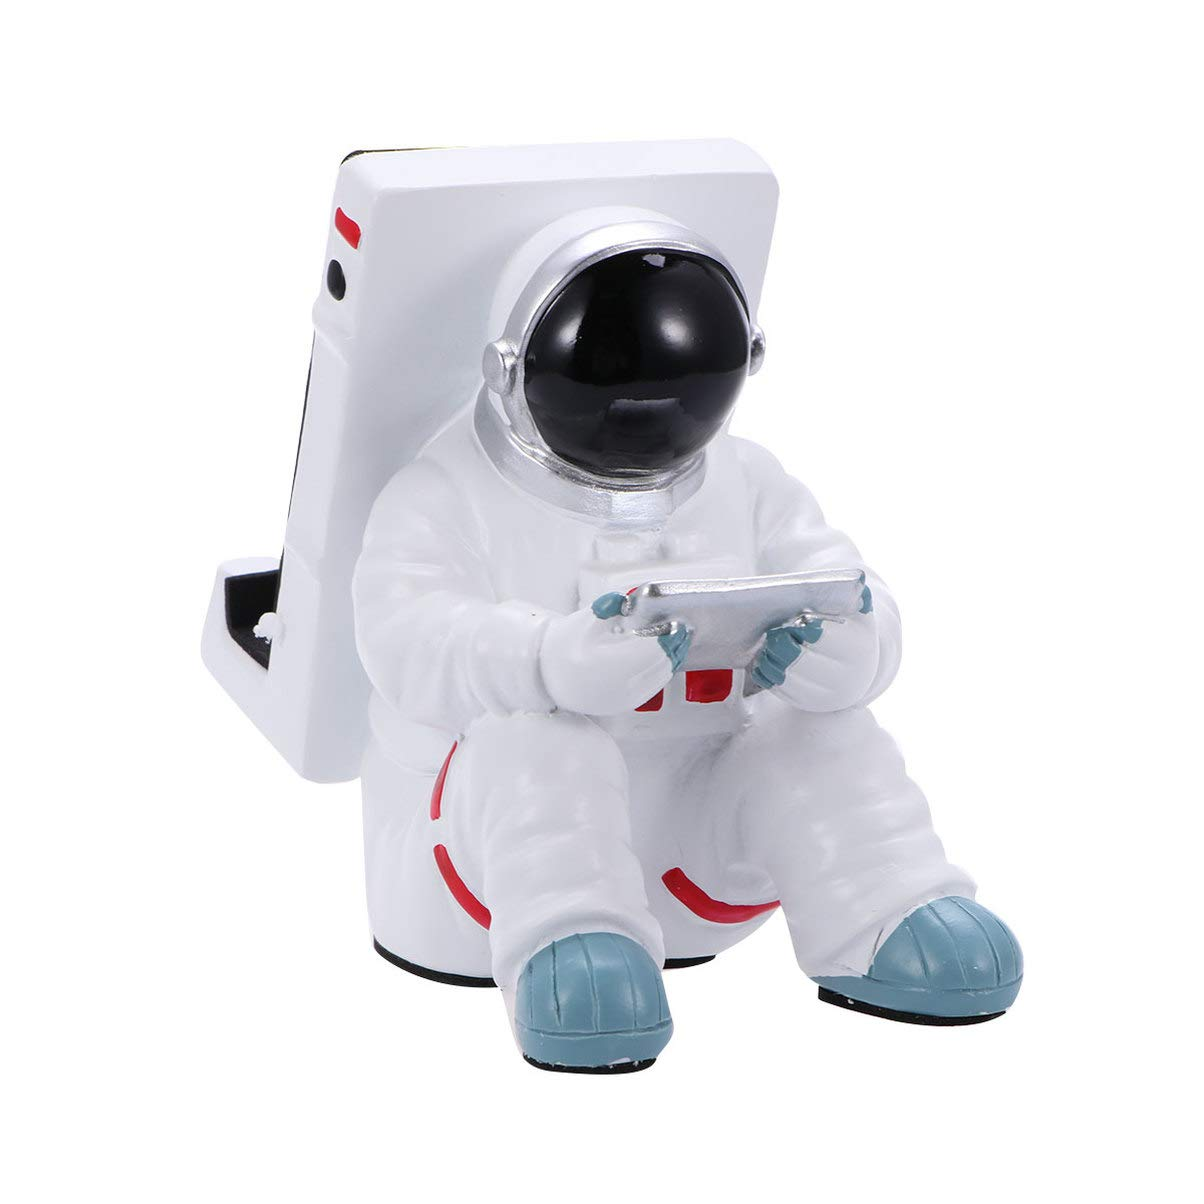 SUPVOX Harz Handyhalter Space Astronaut Smartphone Halter Tischdekoration